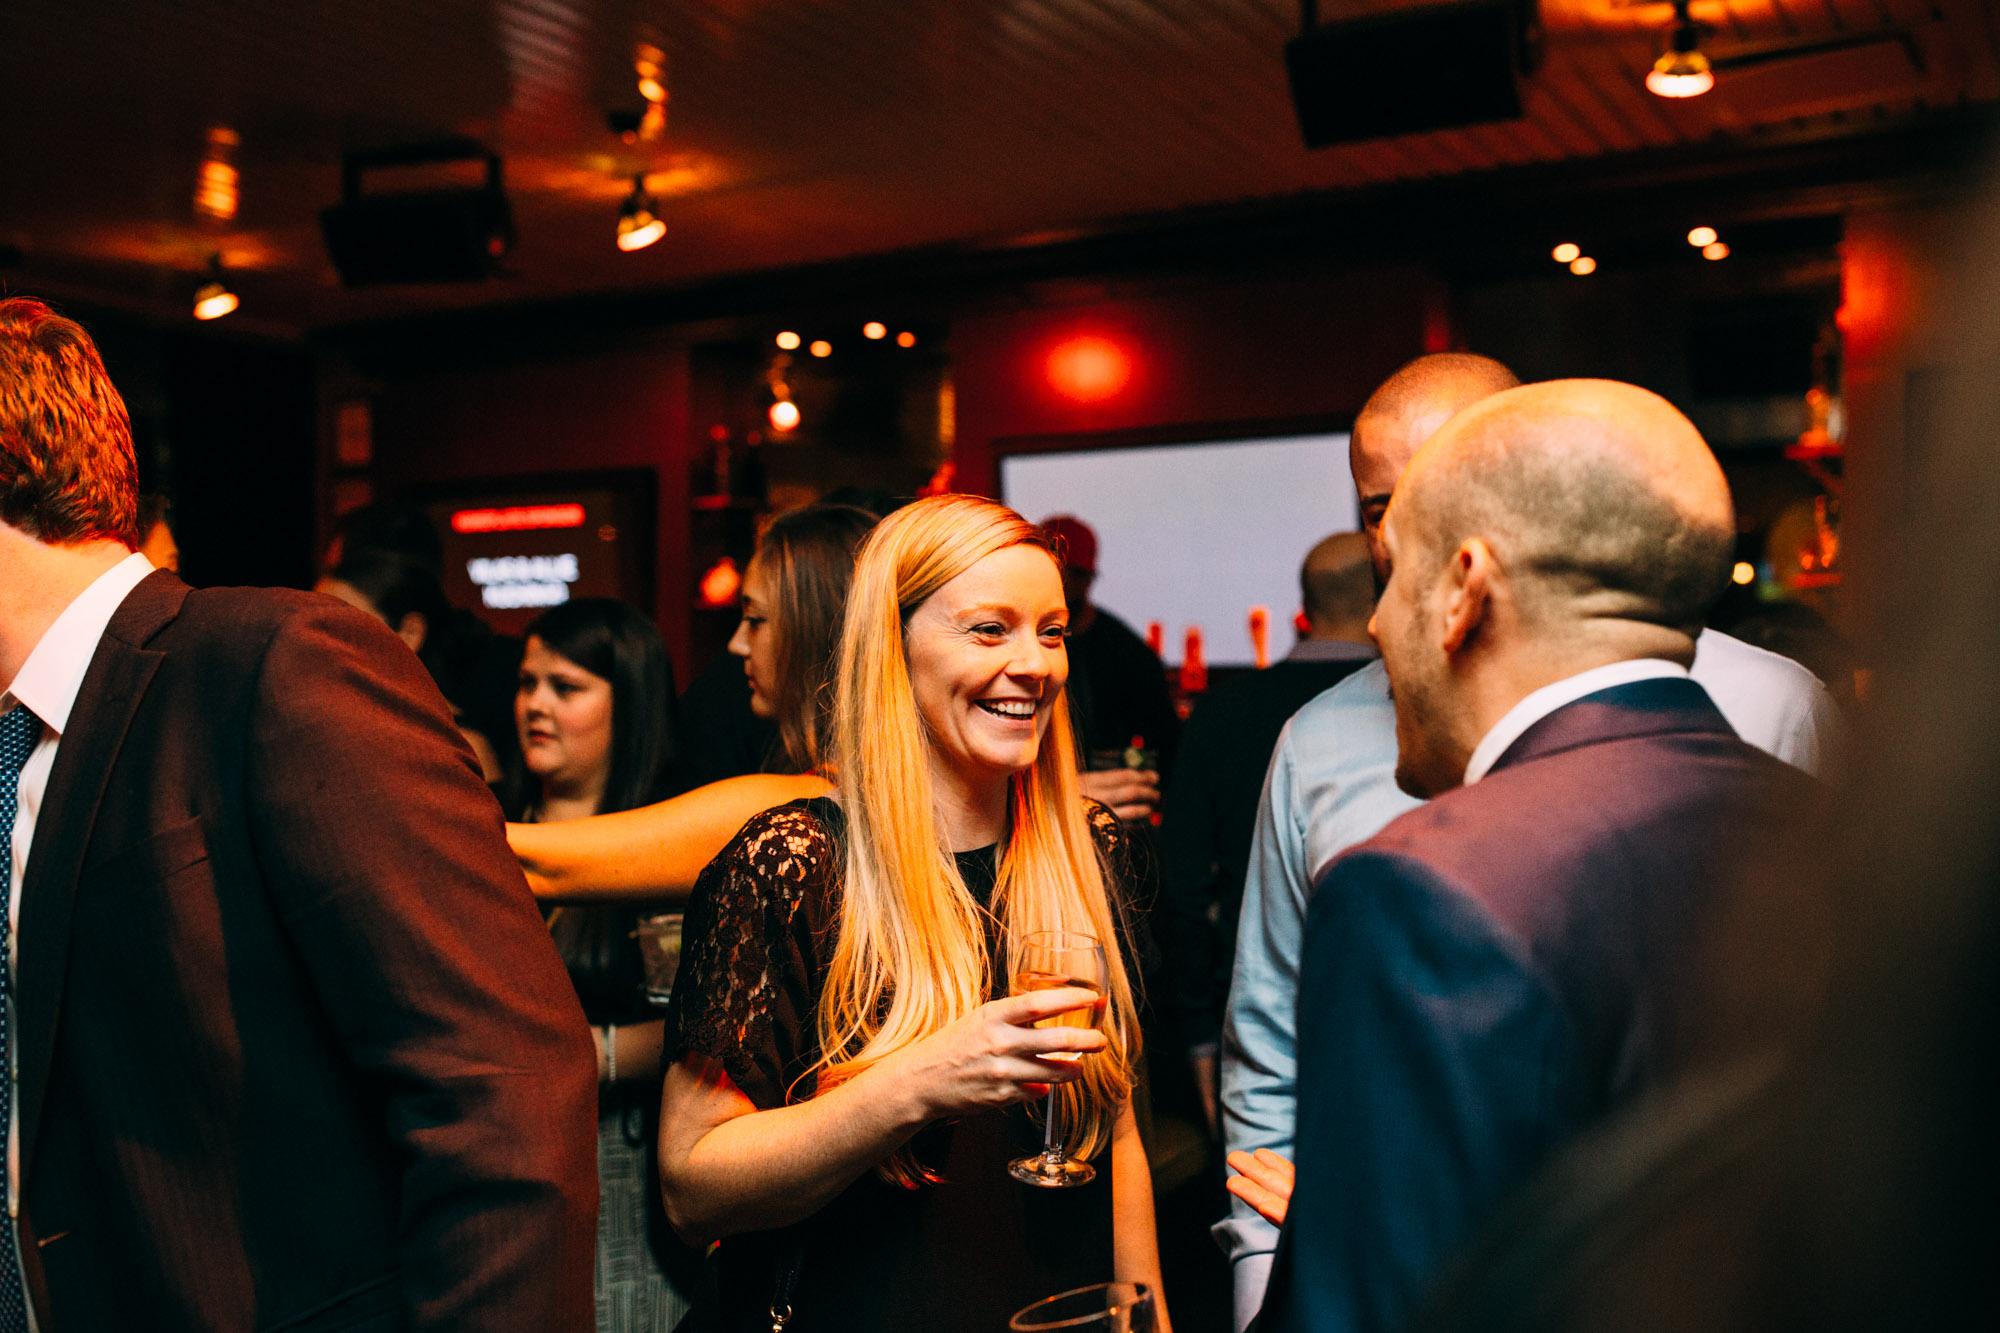 DREAM Charter School - Diamond Ball 2017 Lucky Strike Corporate Event Photographer Rachel Hanon Photography-21.jpg